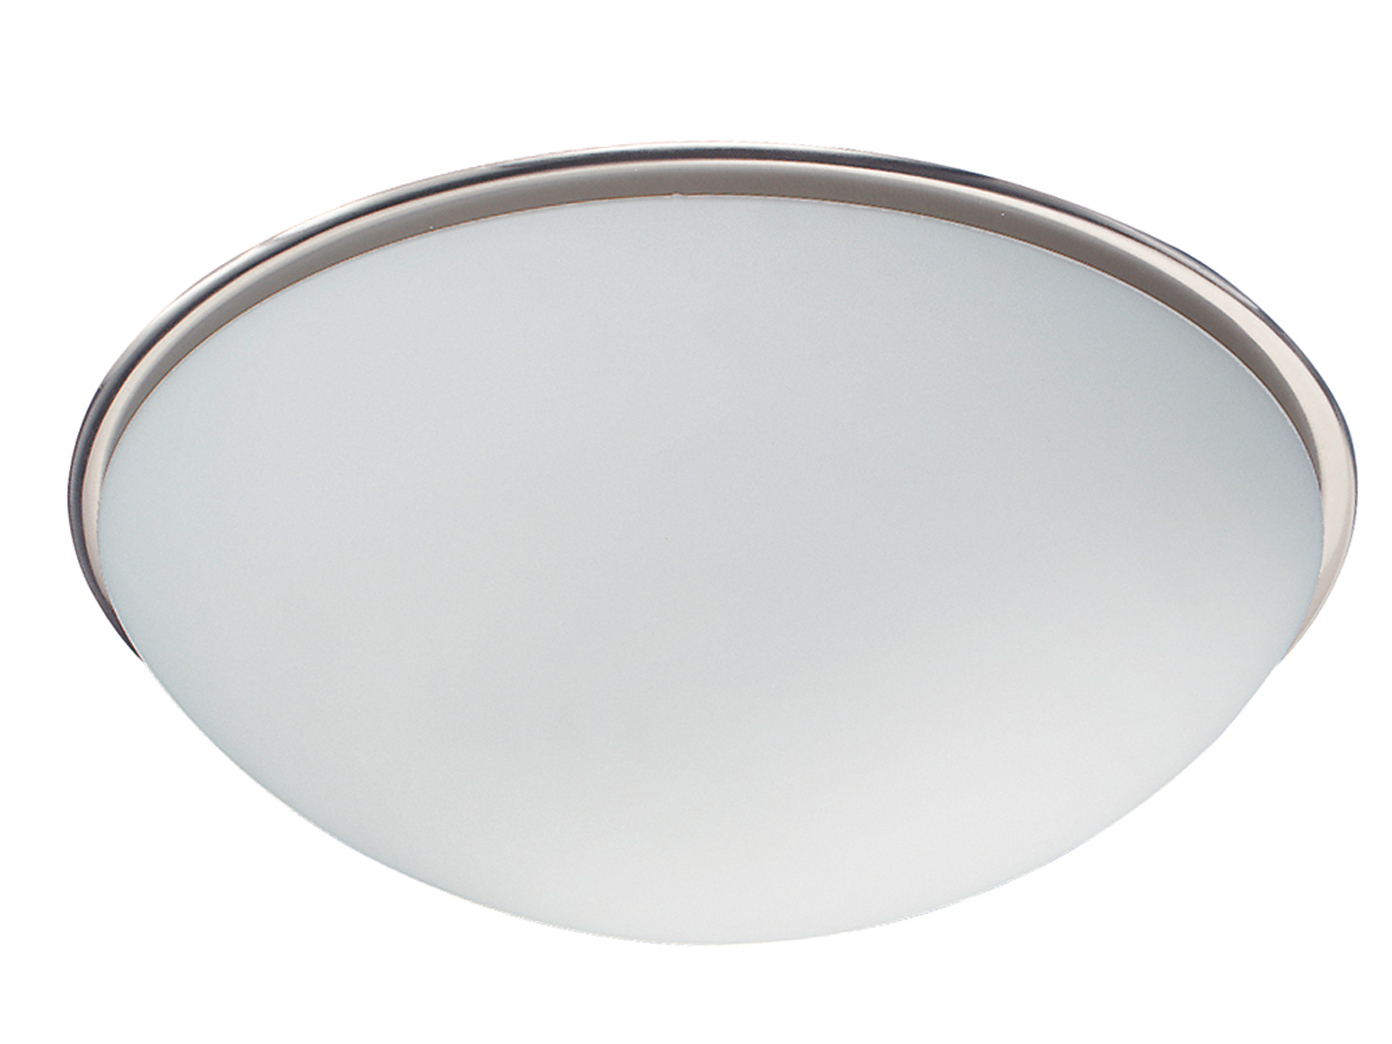 TRIO Deckenleuchte,1 x E27, Ø 30cm, Glas opal matt, Nickel matt